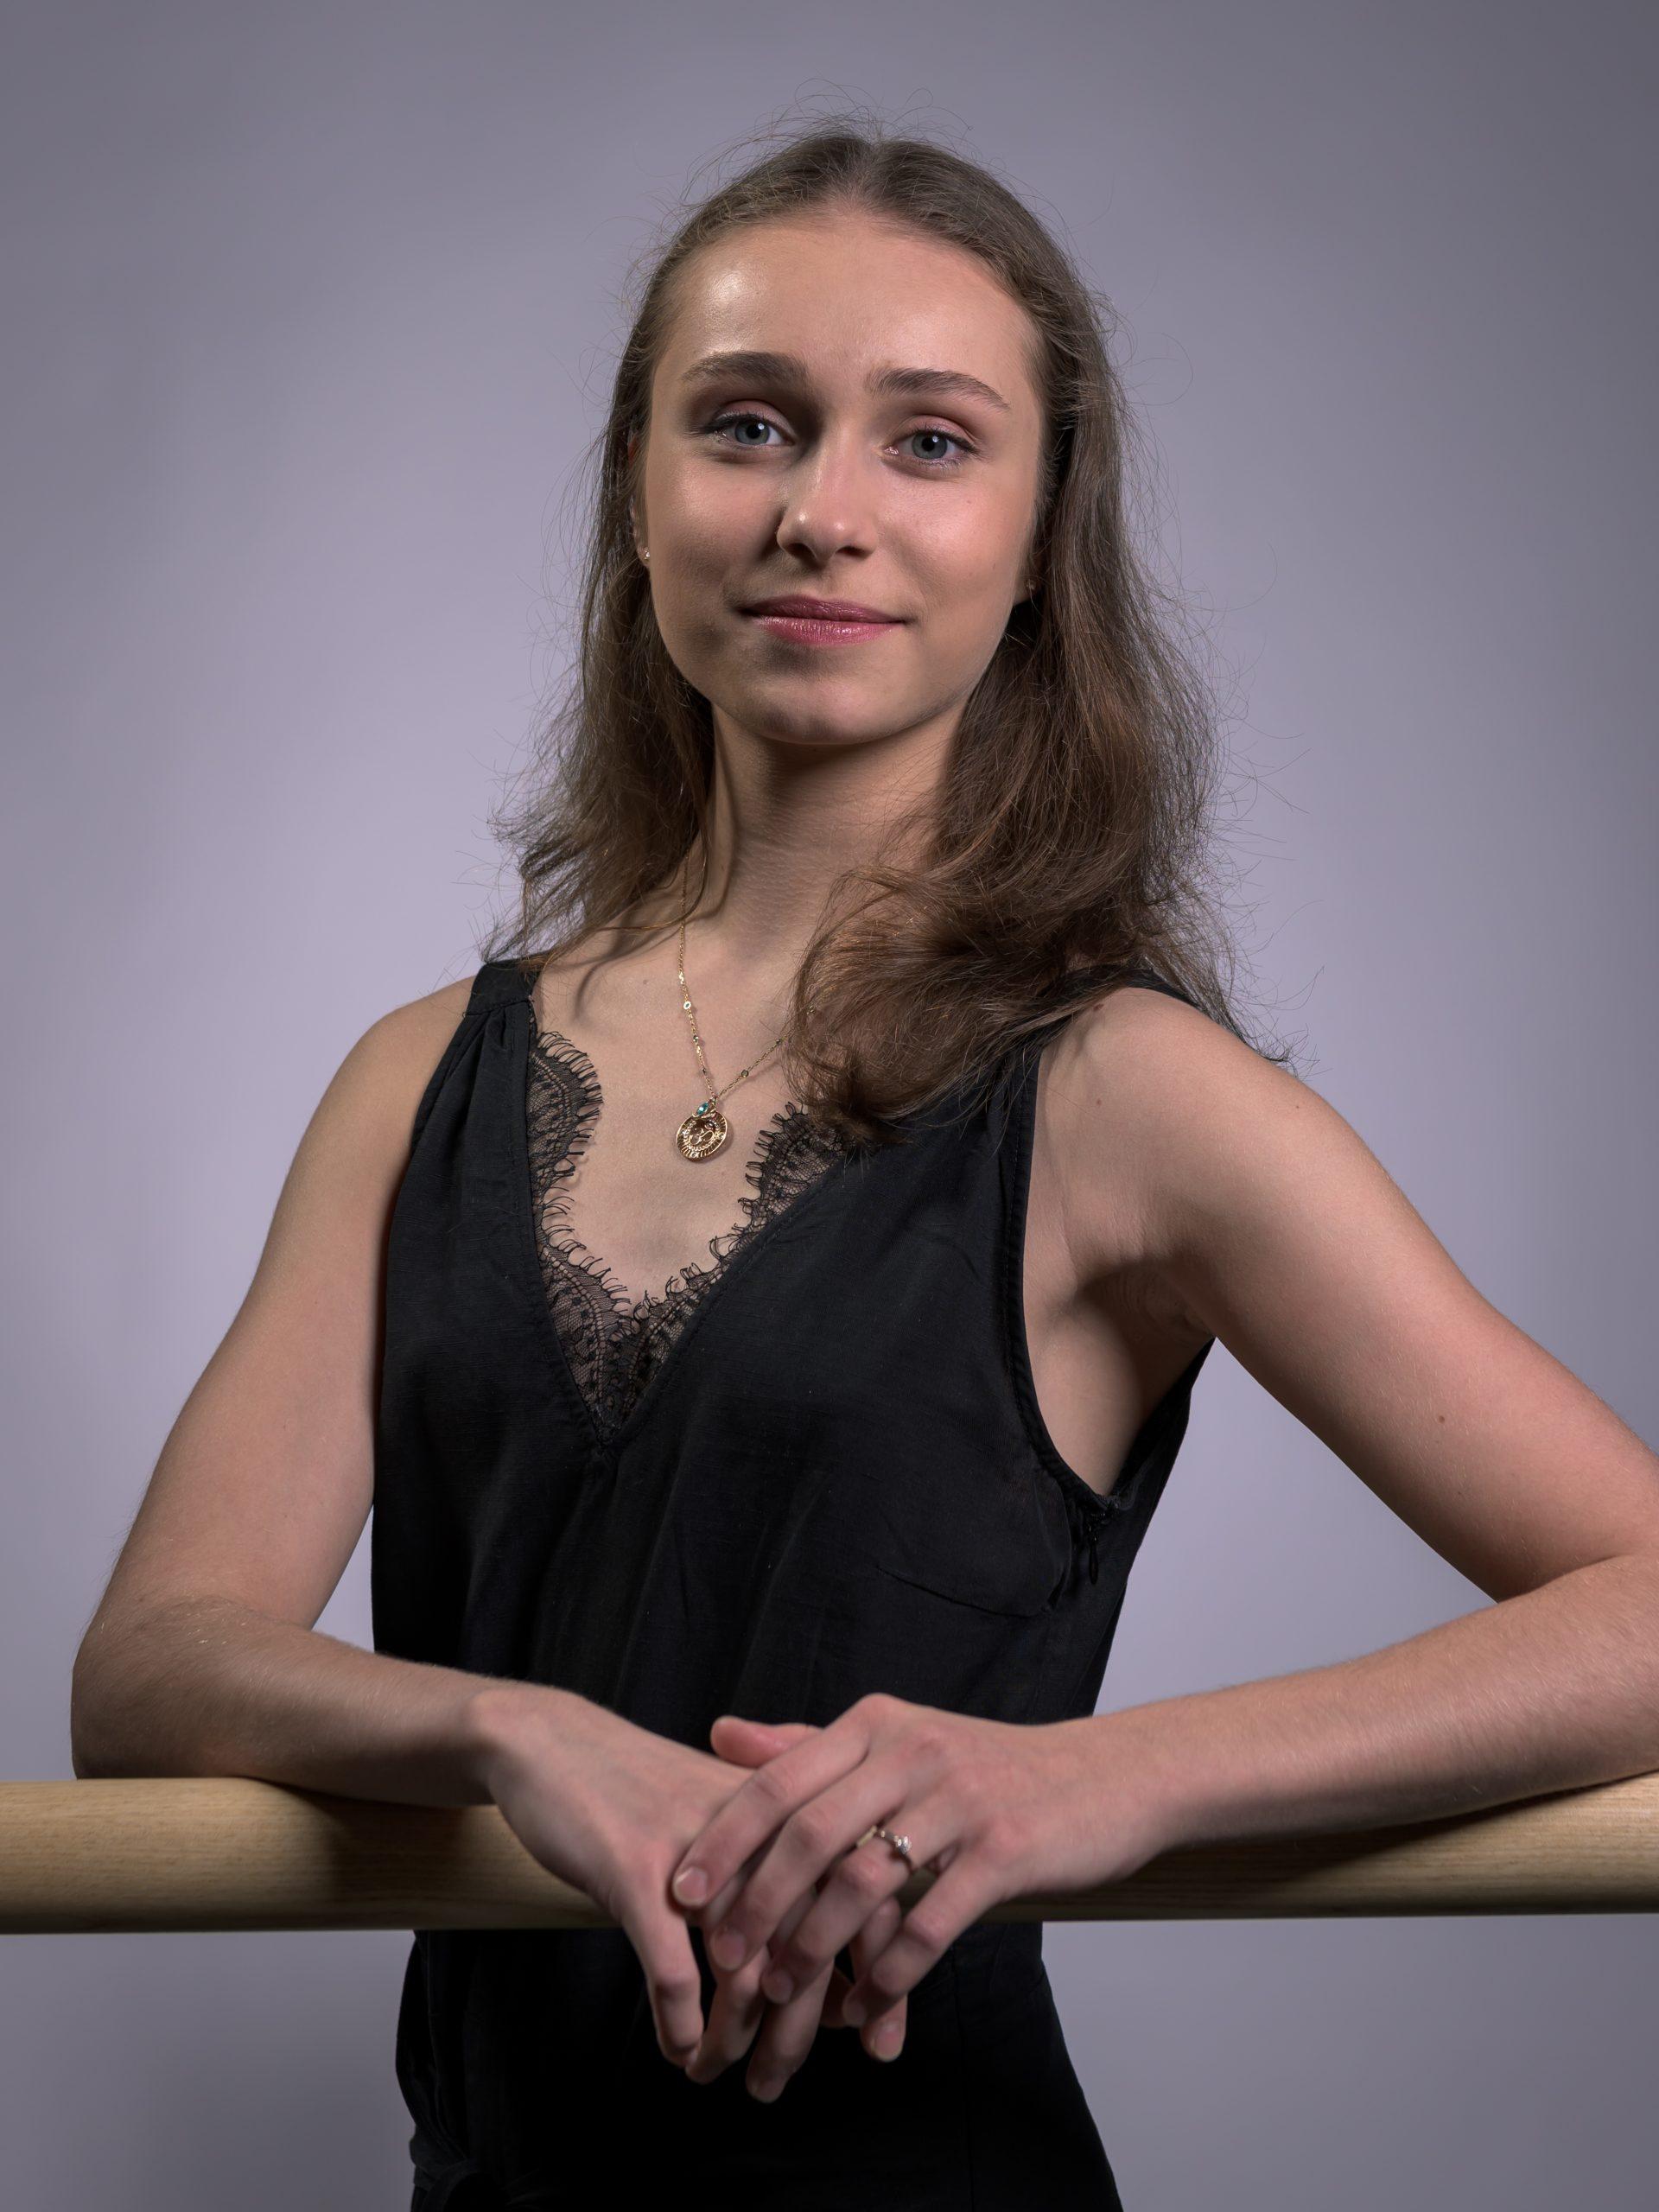 Maria Vorokhobina